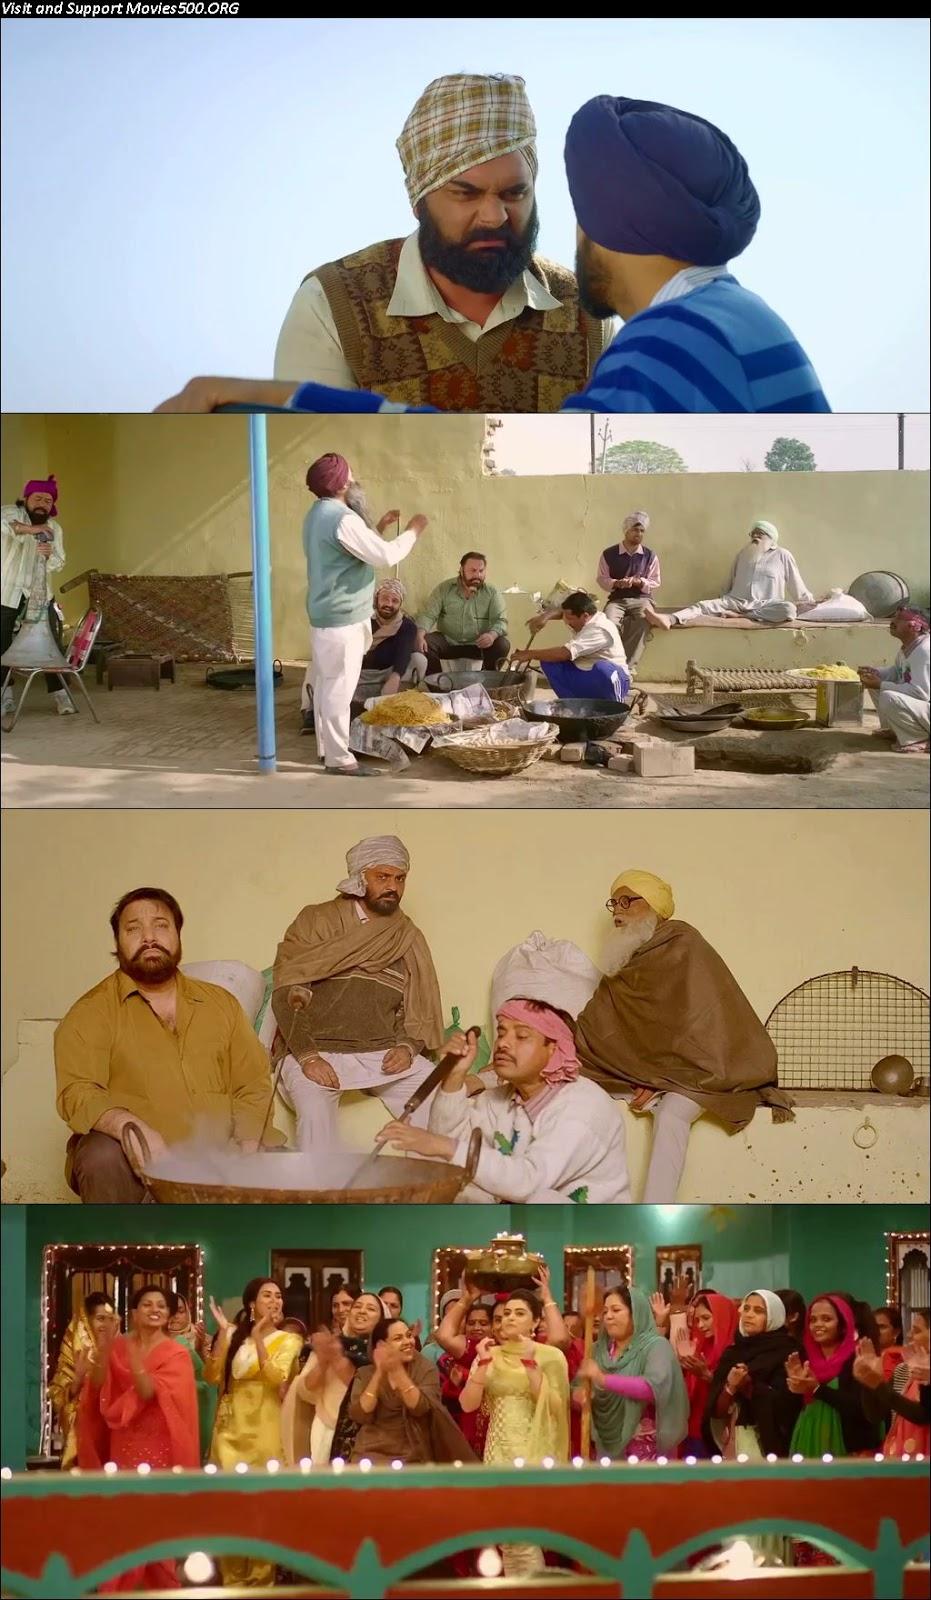 Manje Bistre 2017 Punjabi DVD HD Download WEBRip 720p at freedomcopy.com